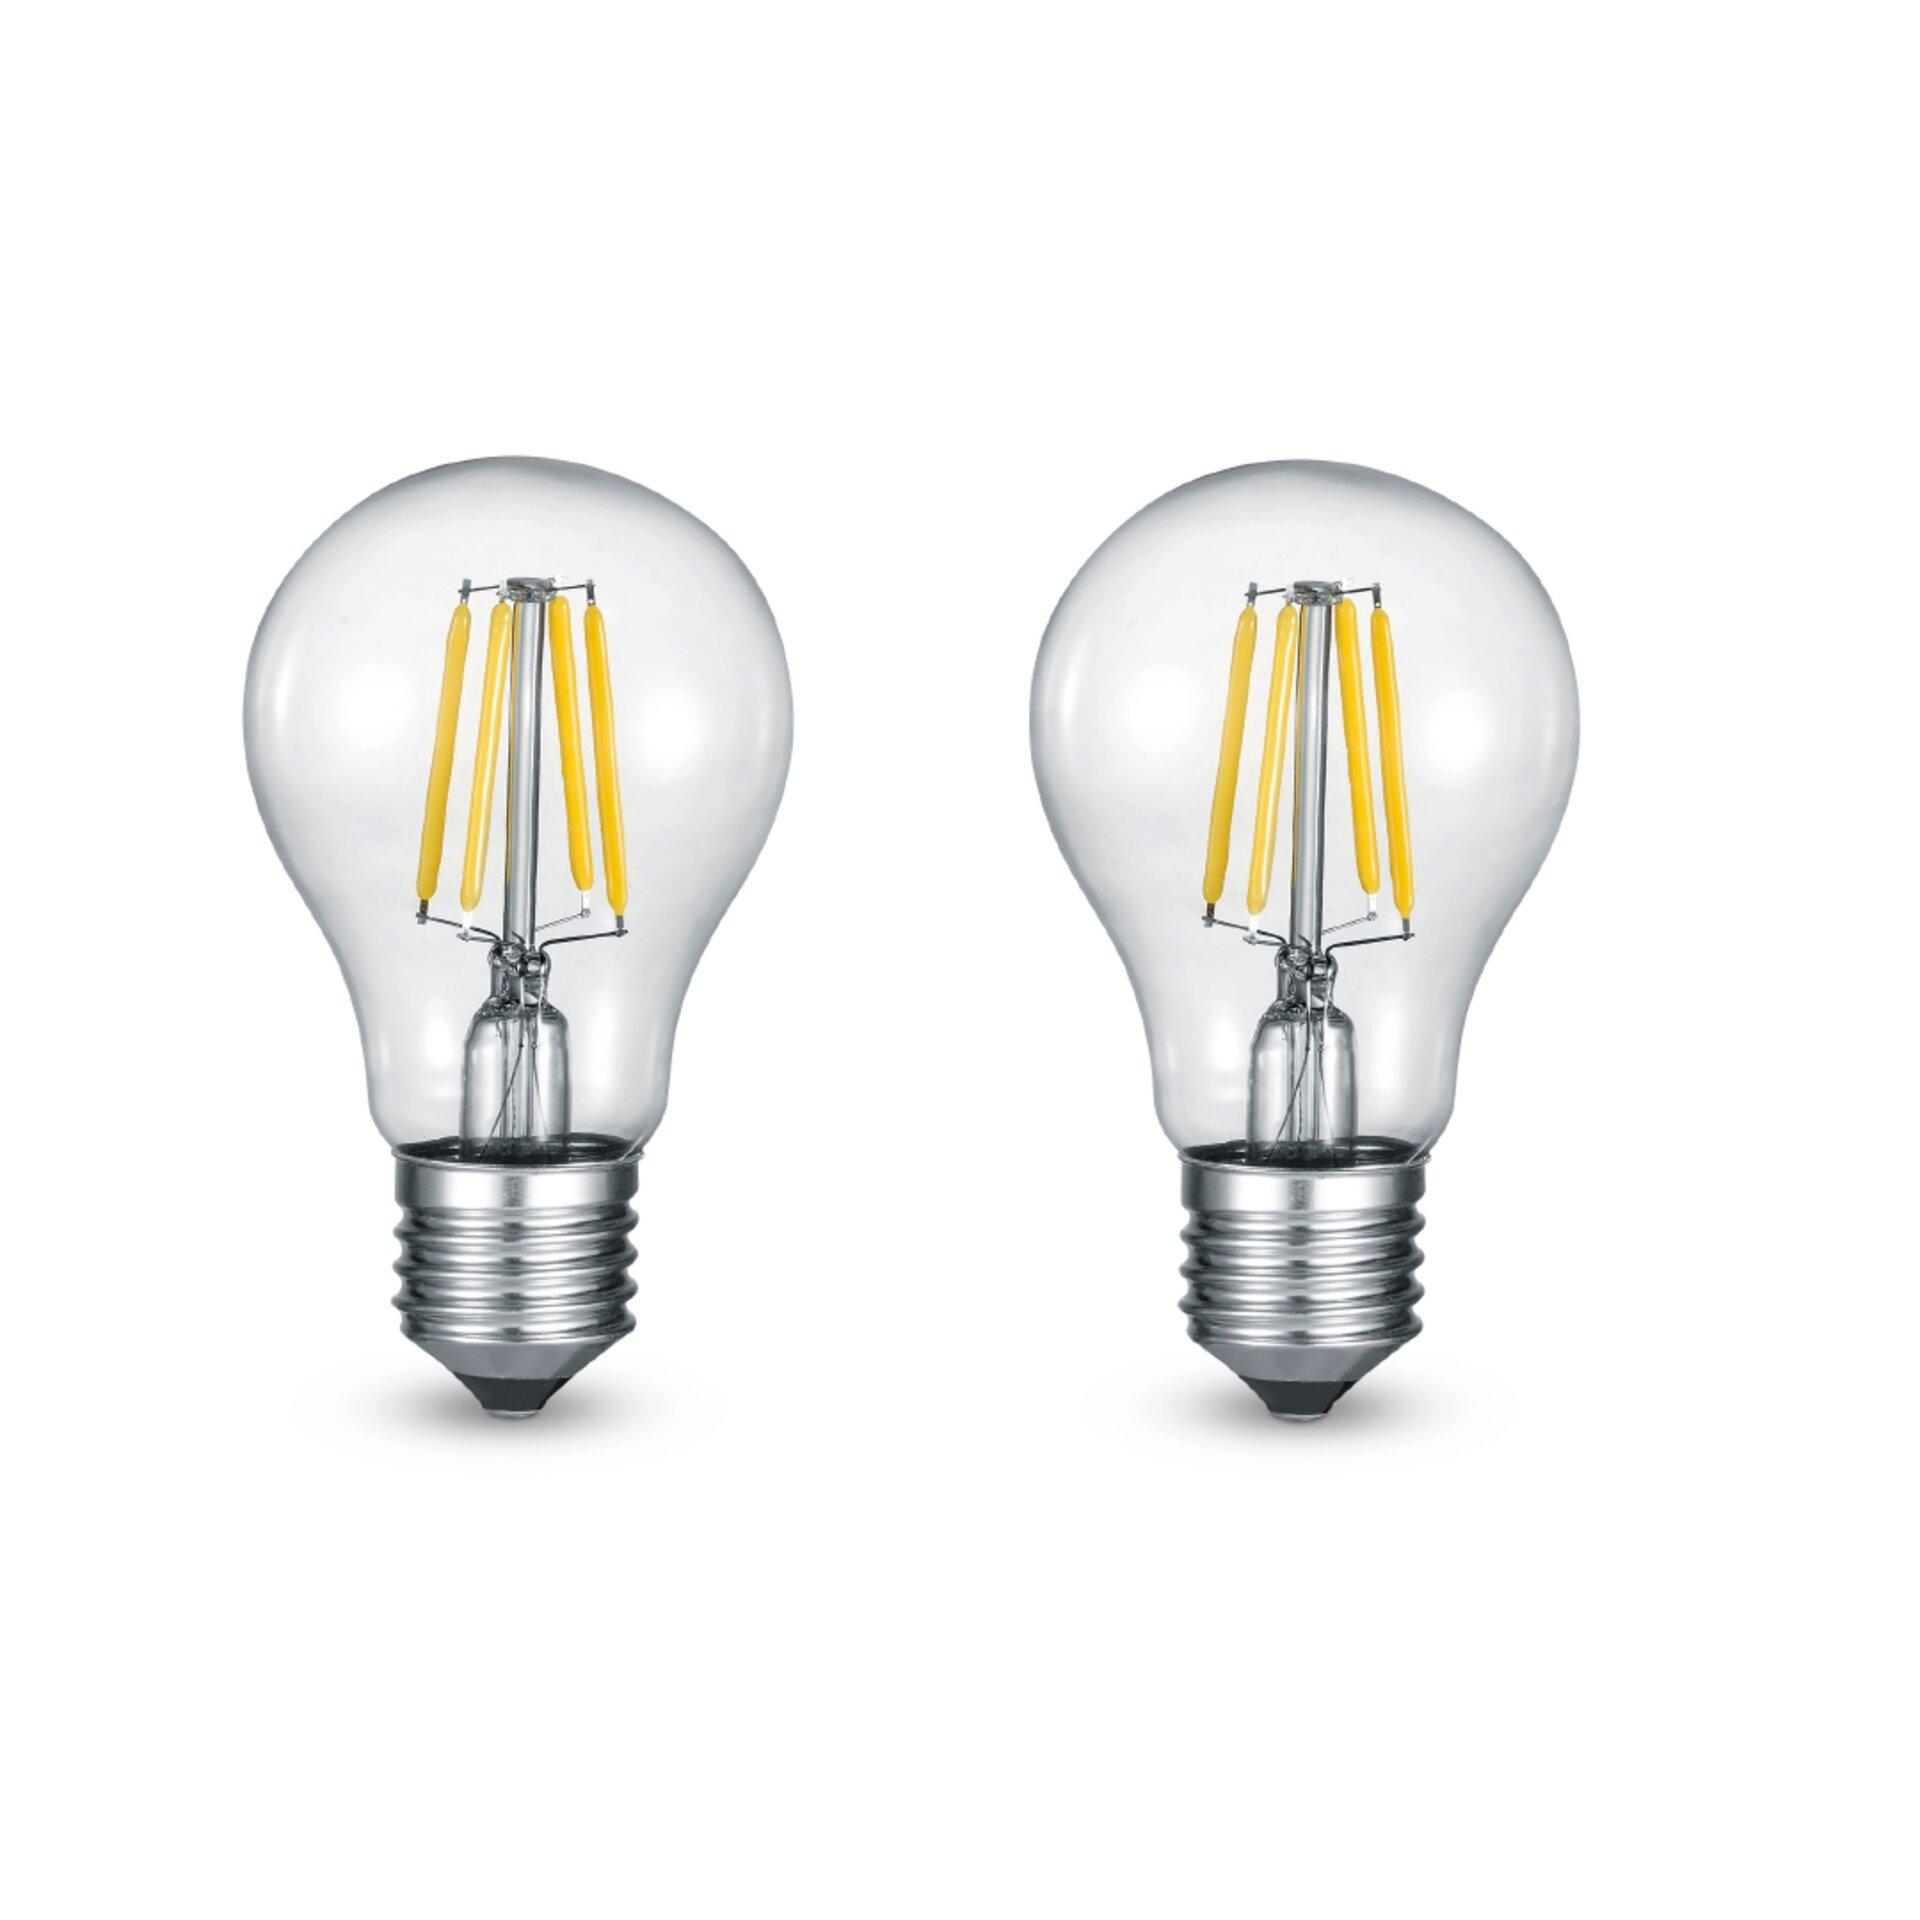 LED Birne klar, E27, A+